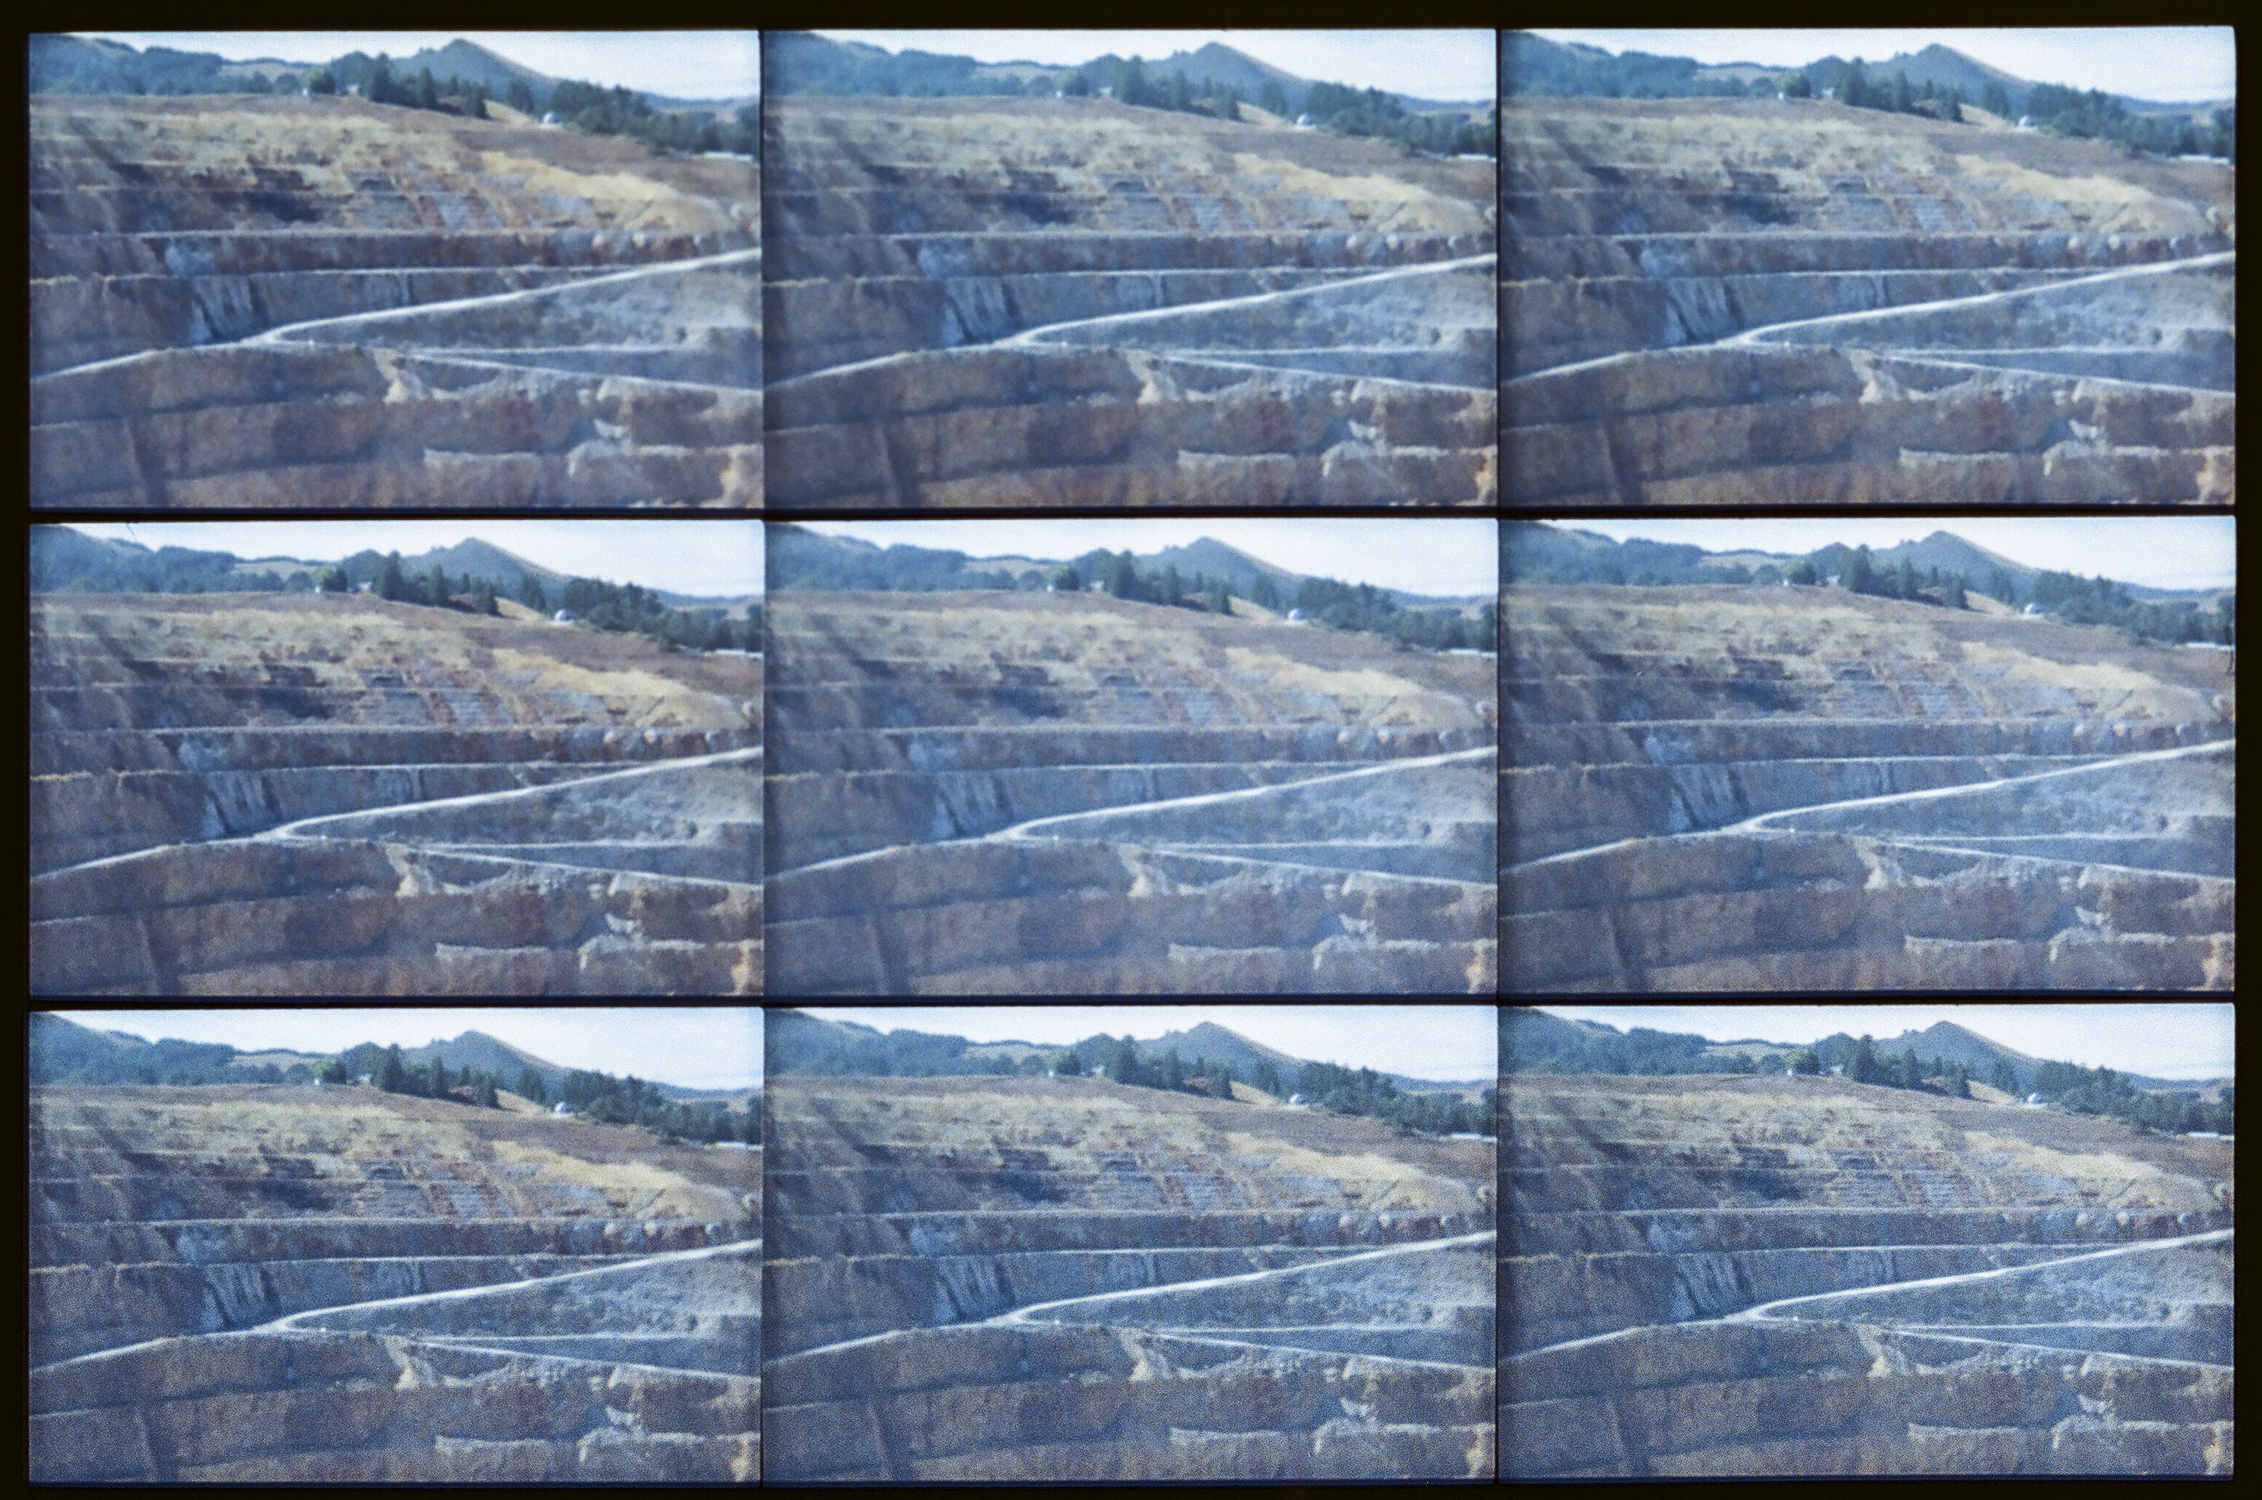 Mining-Heydt-000117970003.jpg